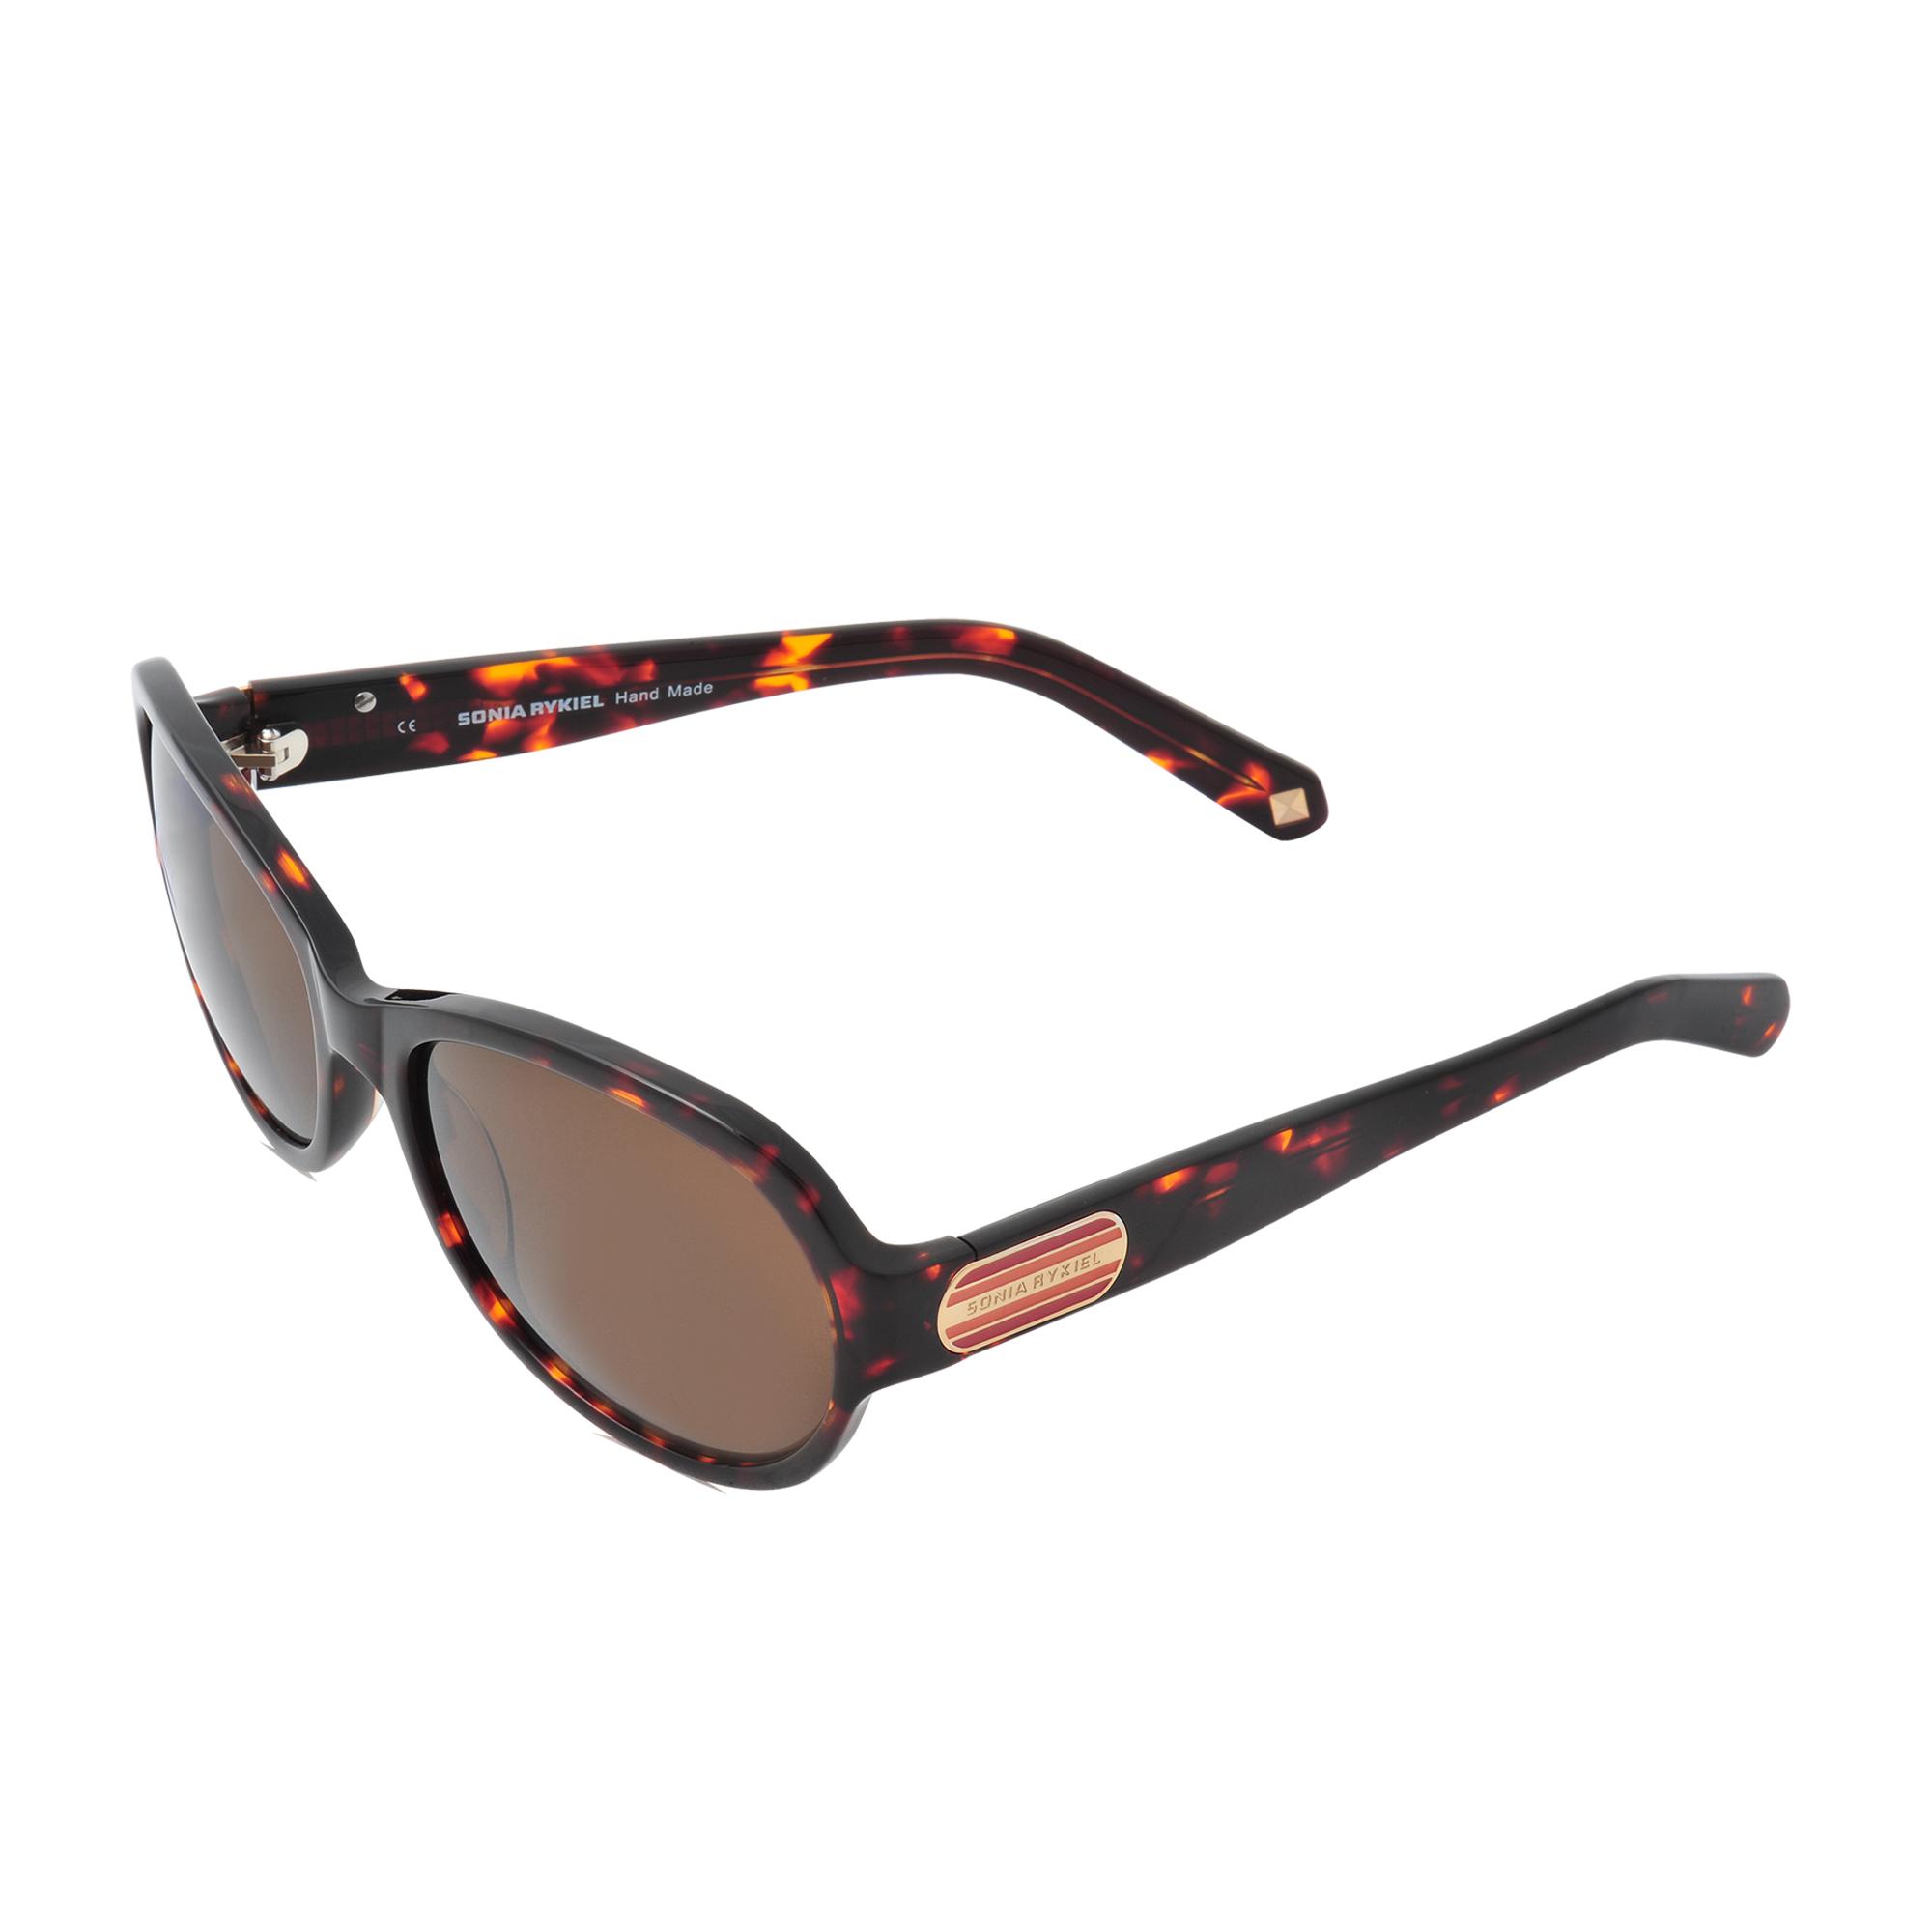 2b2f5f2e004 Sonia Rykiel Sr7686 Scaled Sunglasses in Brown - Lyst